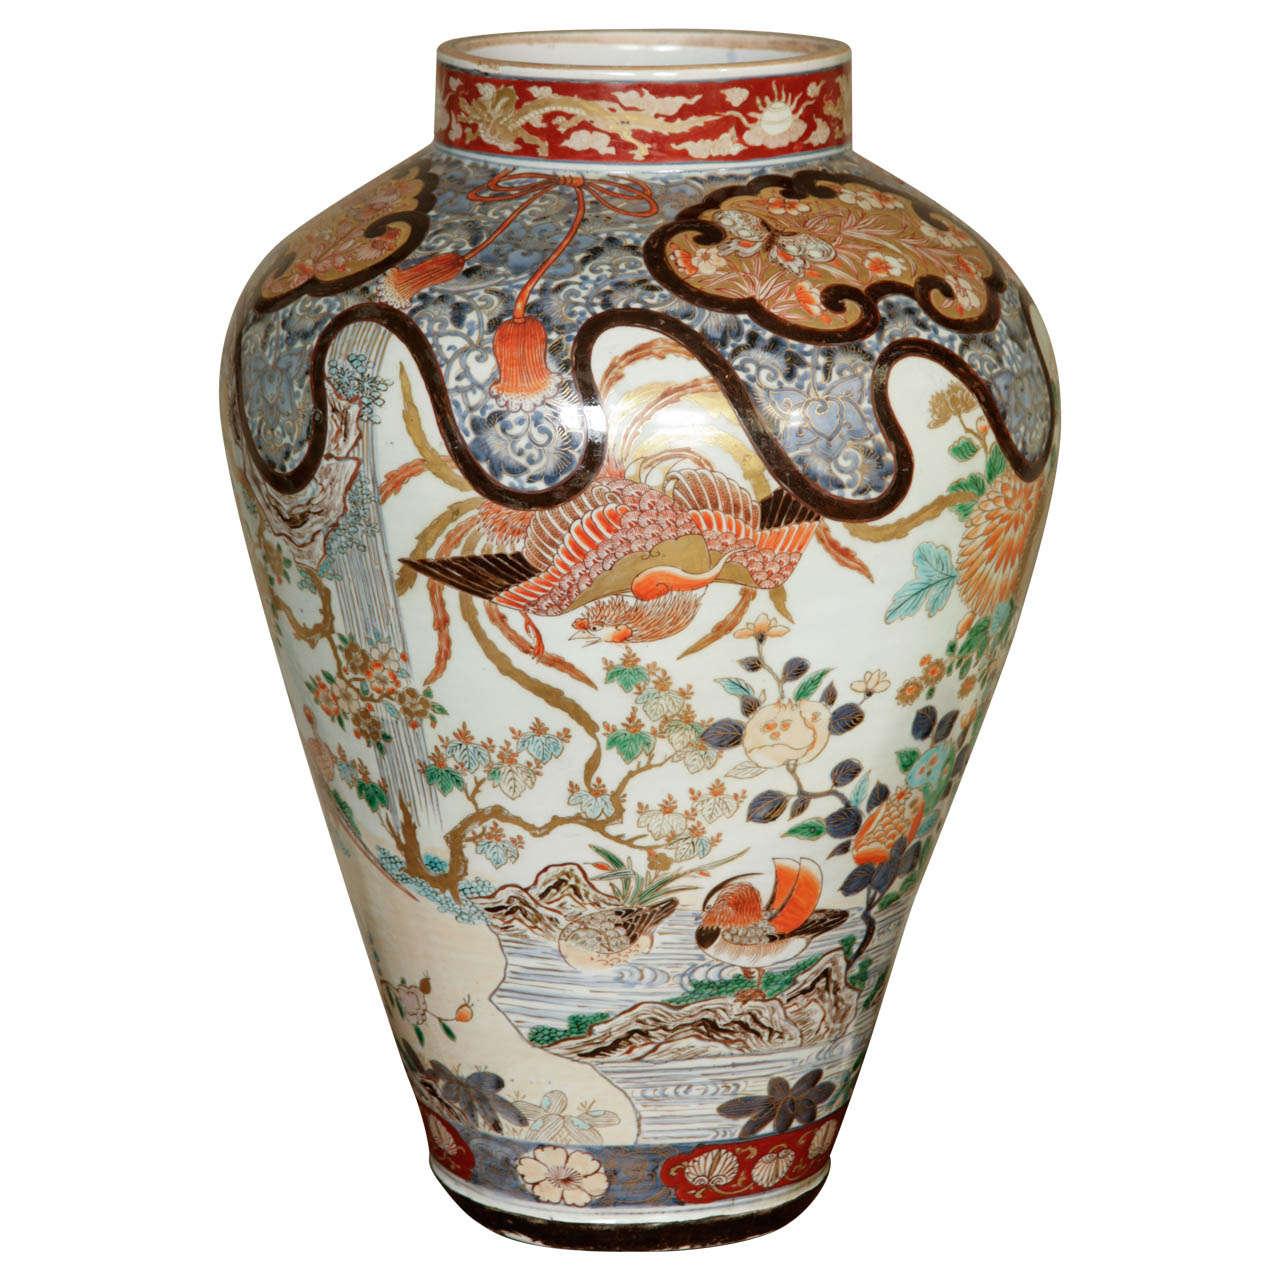 Early 18th Century Japanese Imari Vase For Sale